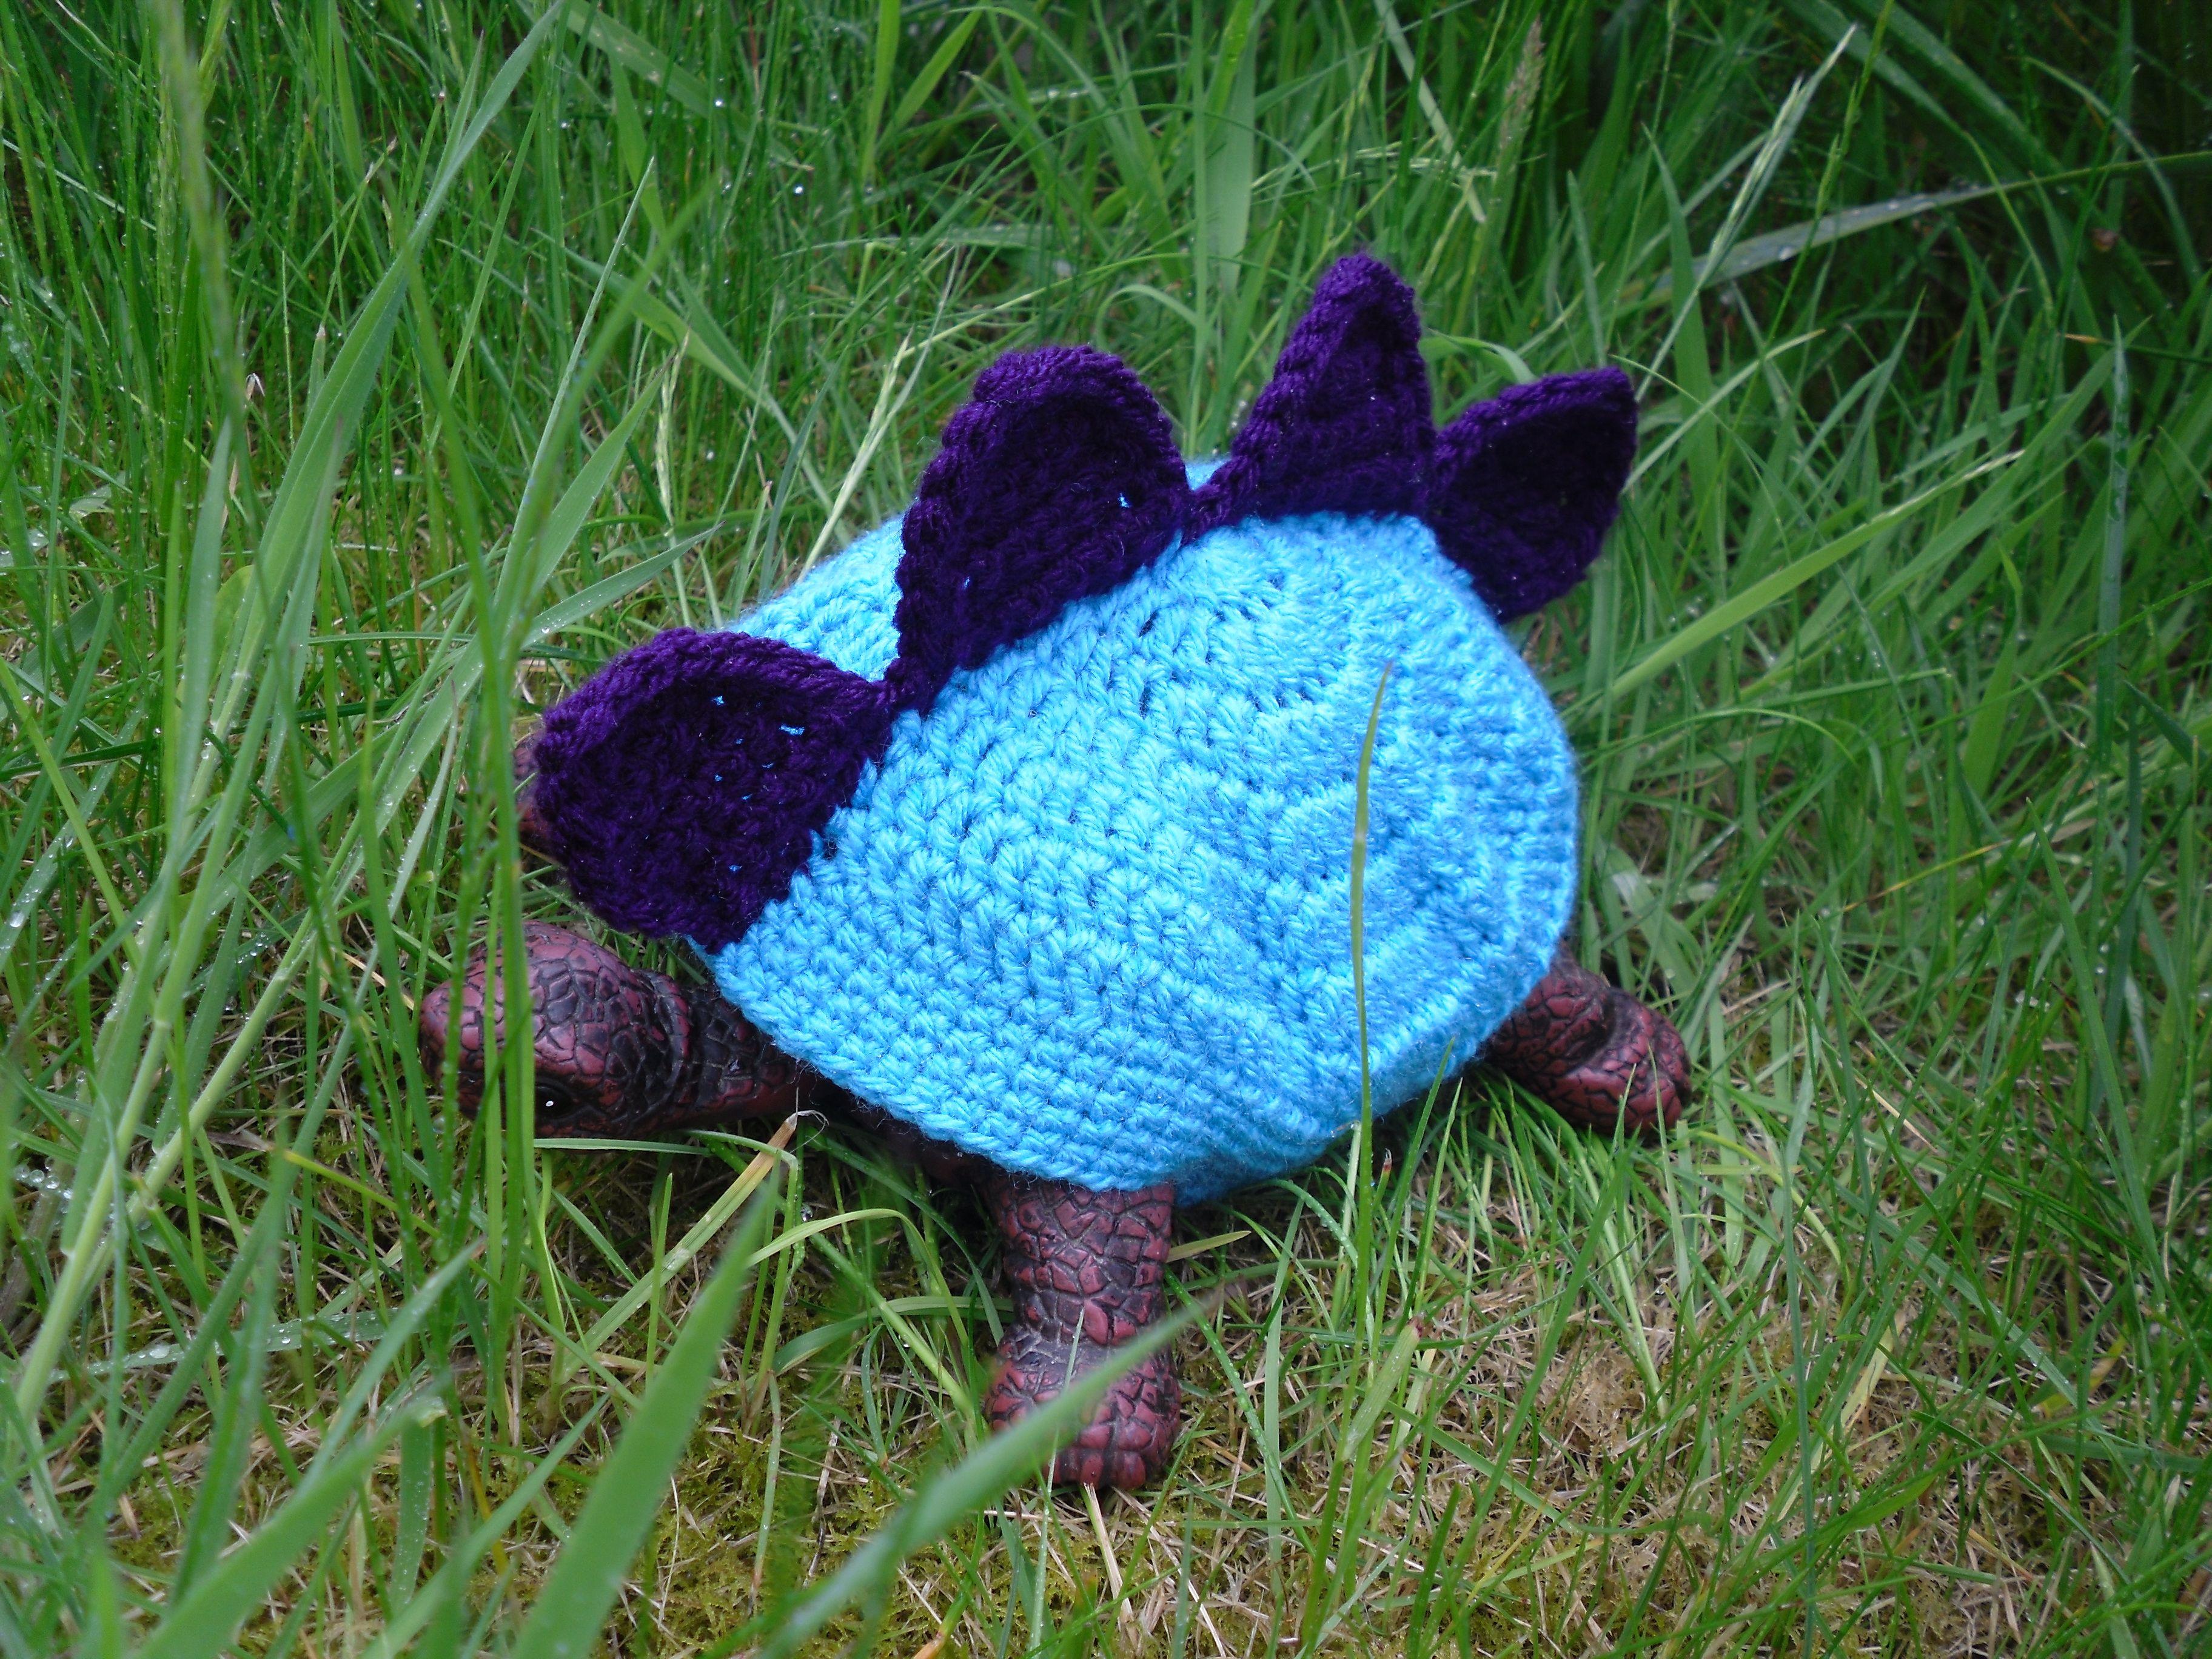 Amigurumi Tortoise Tutorial : Crochet tortoise shell cover feeling crafty